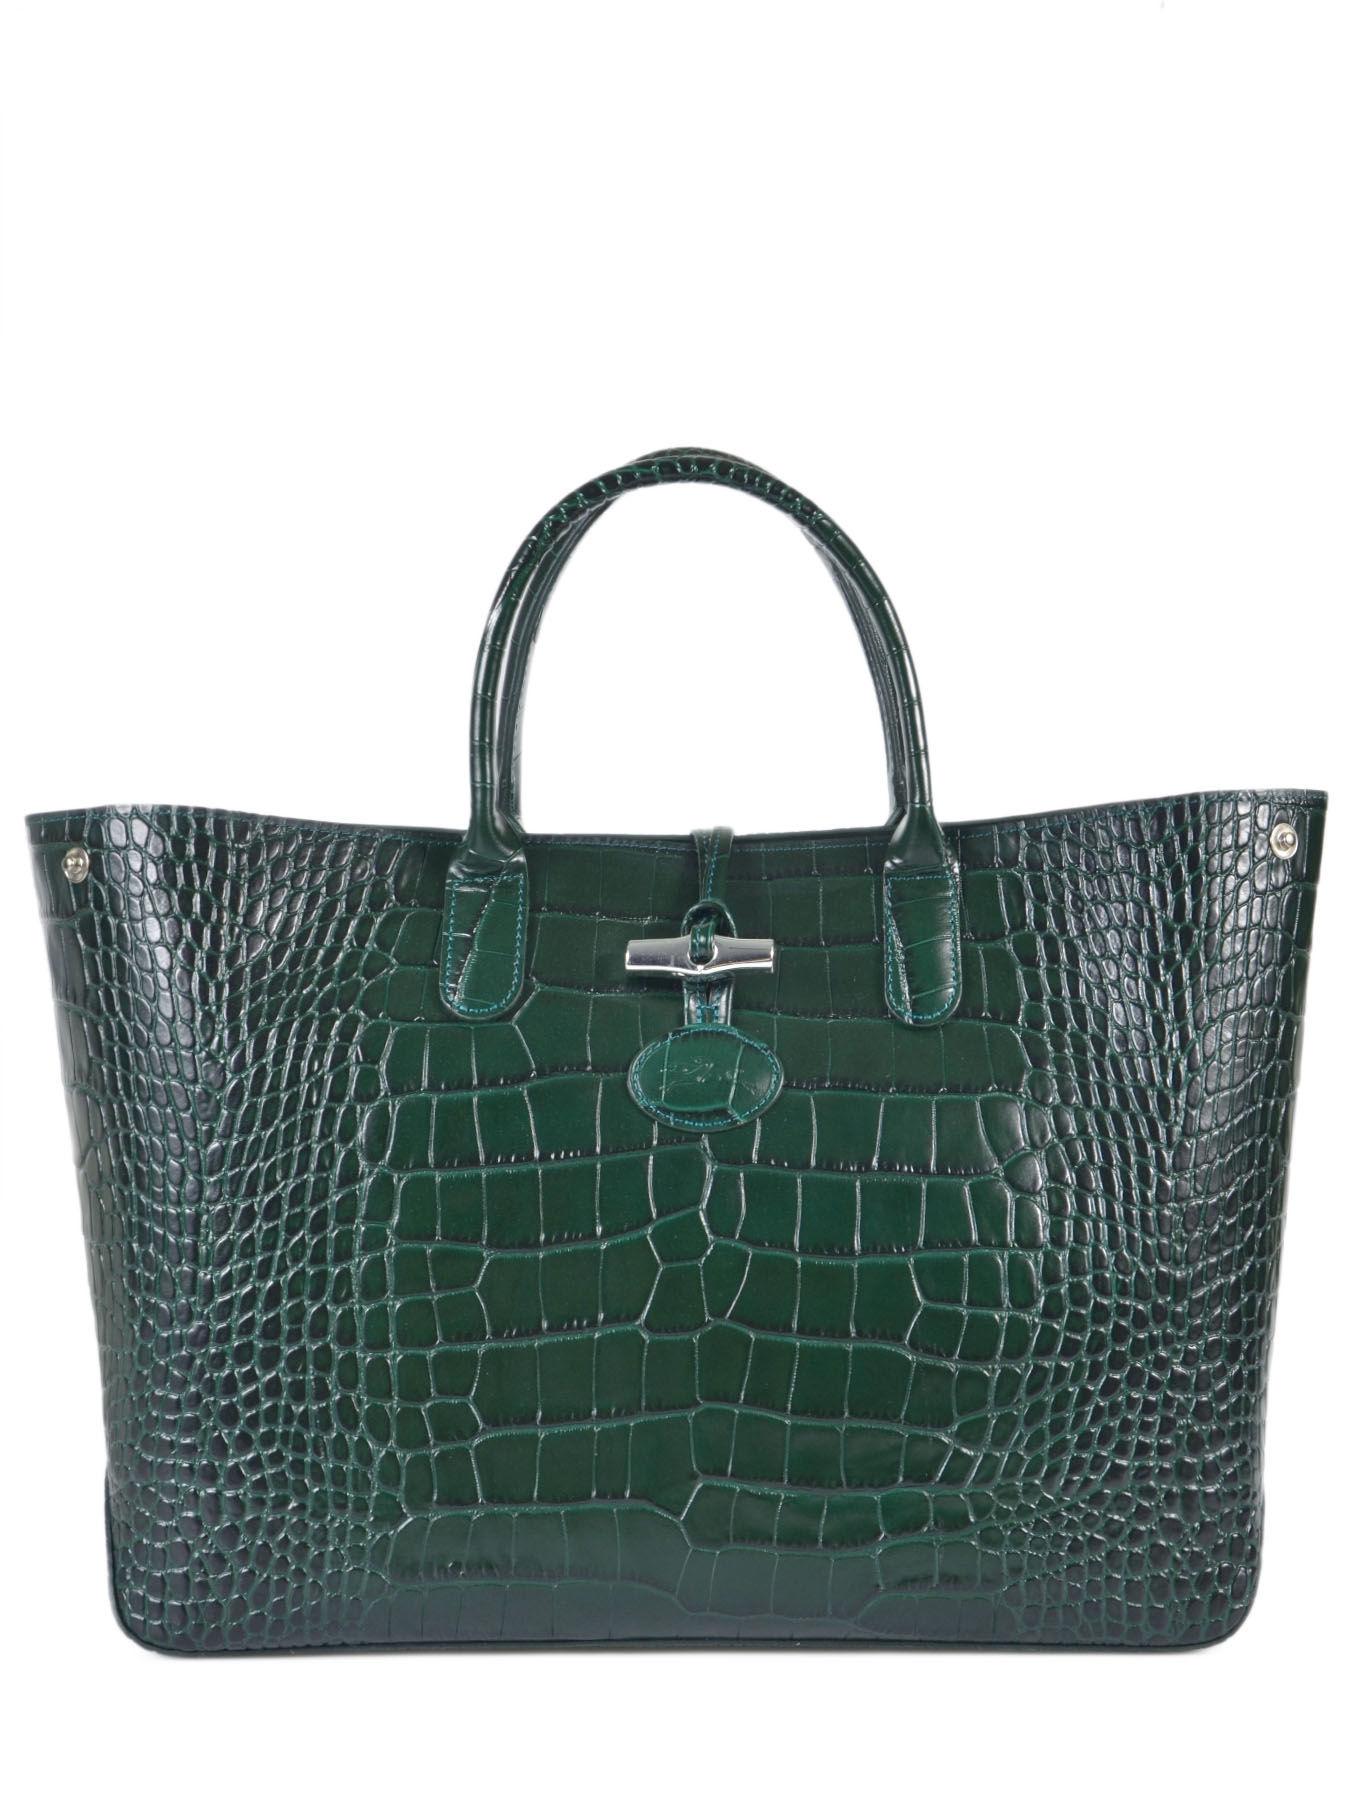 Sac Longchamp Roseau Porté épaule : Sac port main longchamp roseau croco sapin en vente au